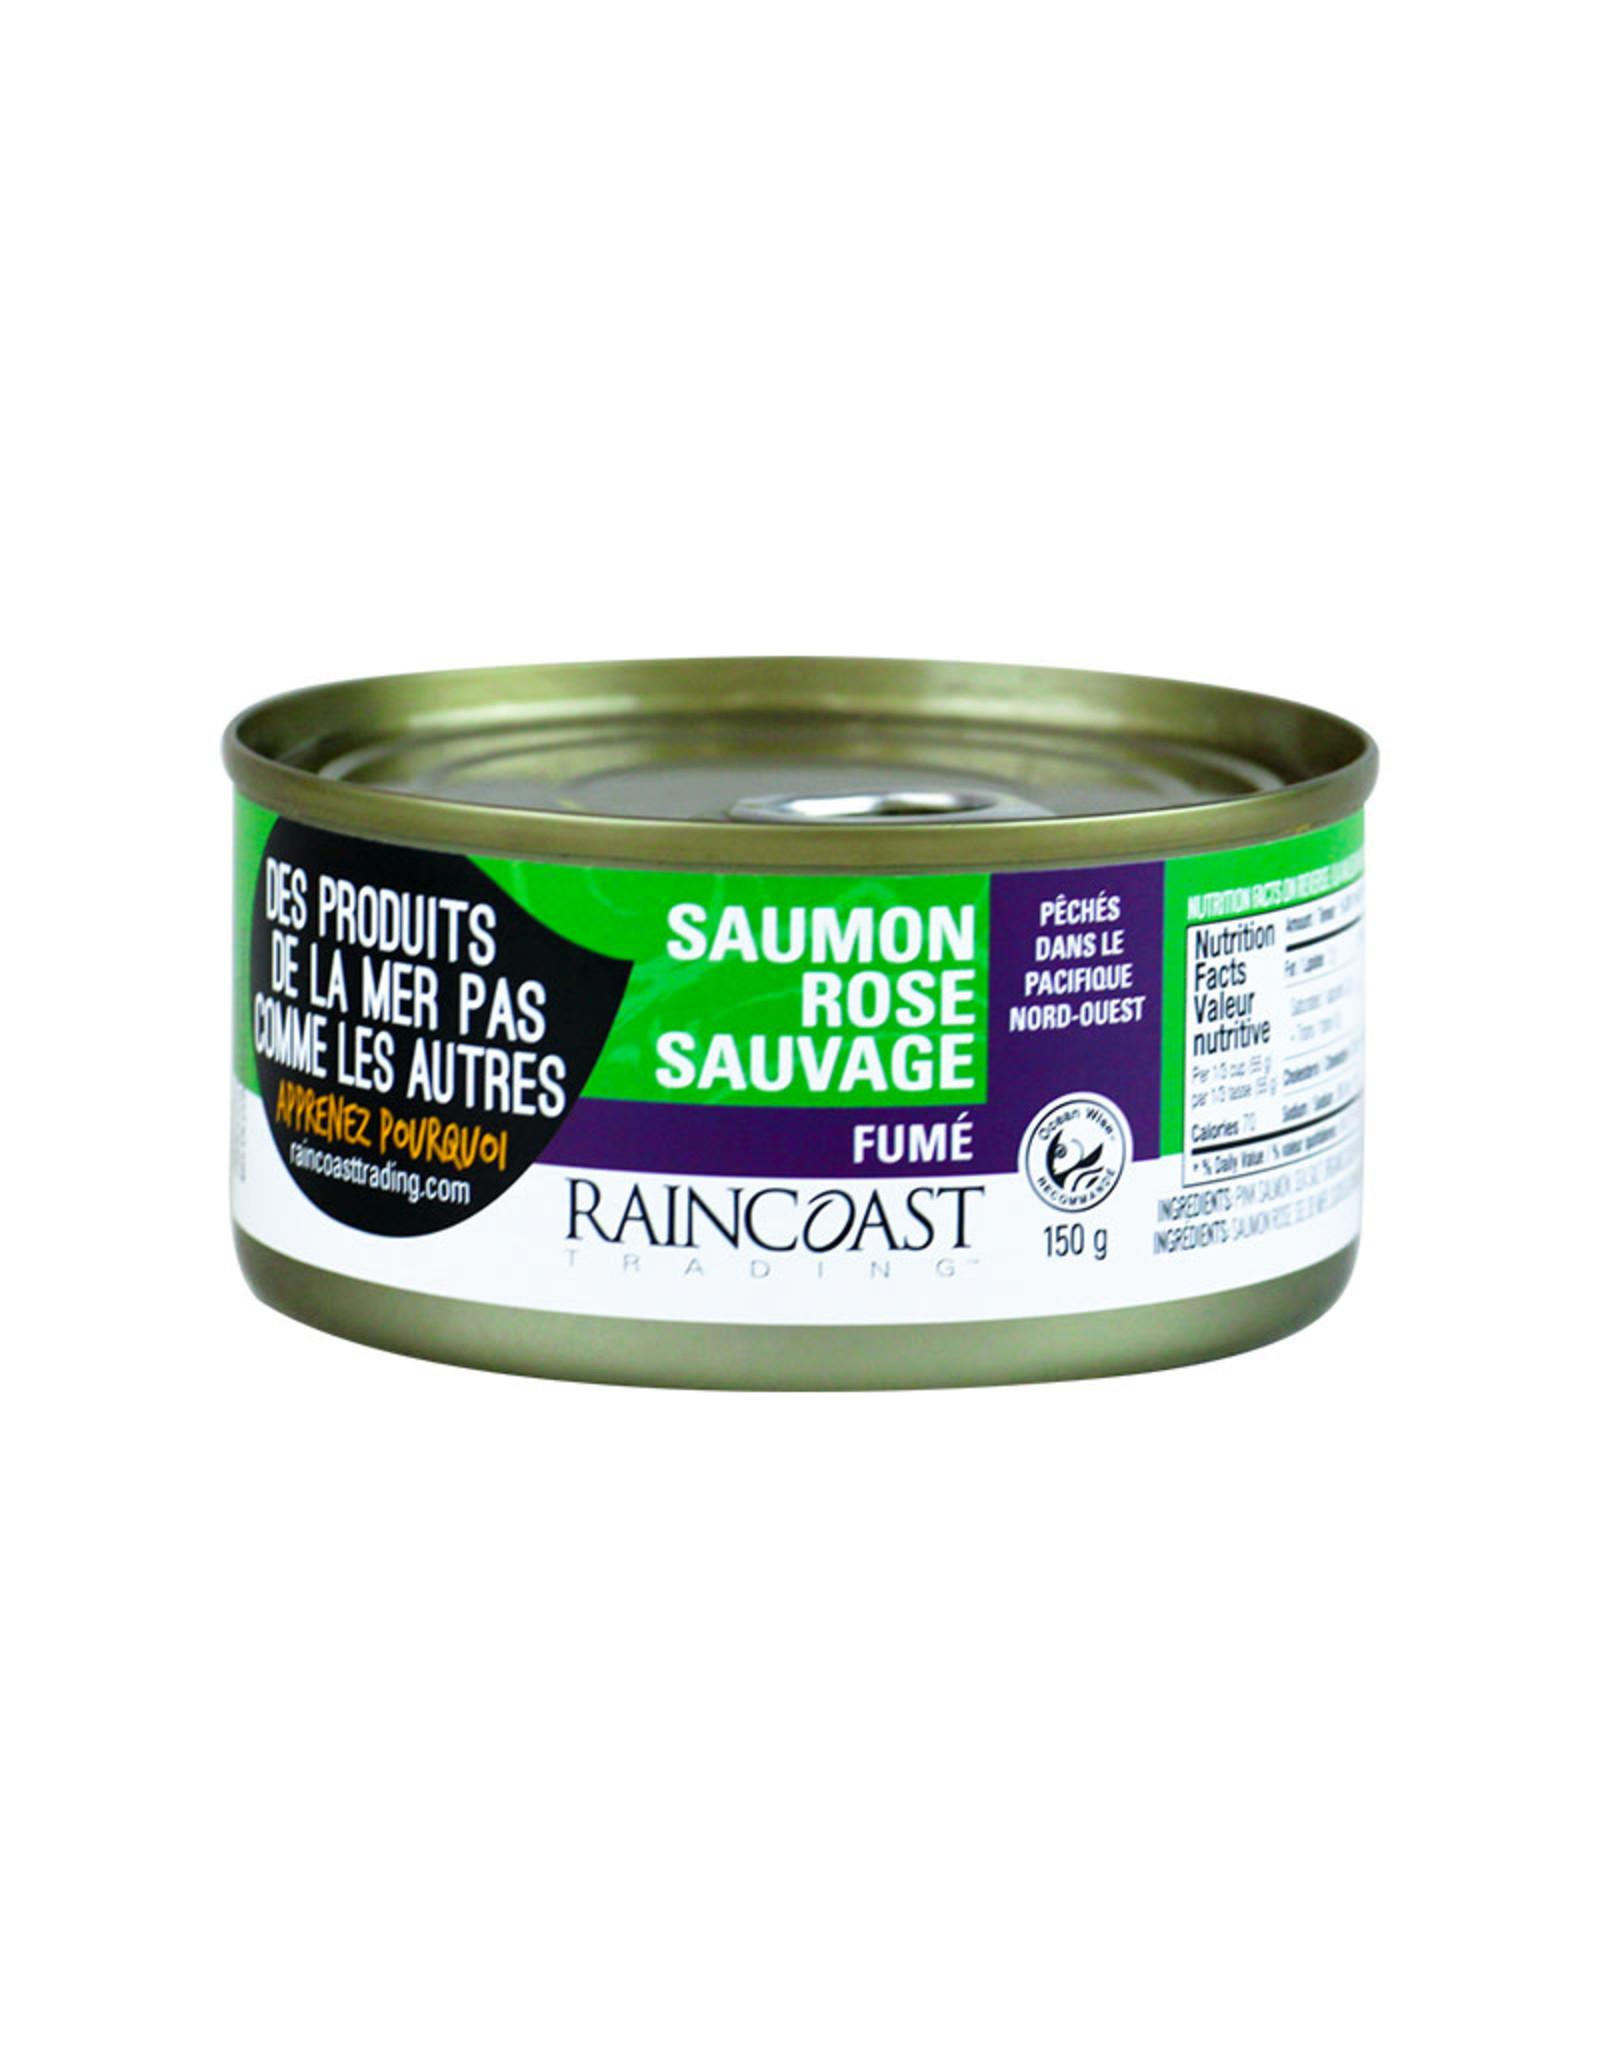 Raincoast Trading Raincoast Trading - Saumon Rose Sauvage, Fumé (150g)